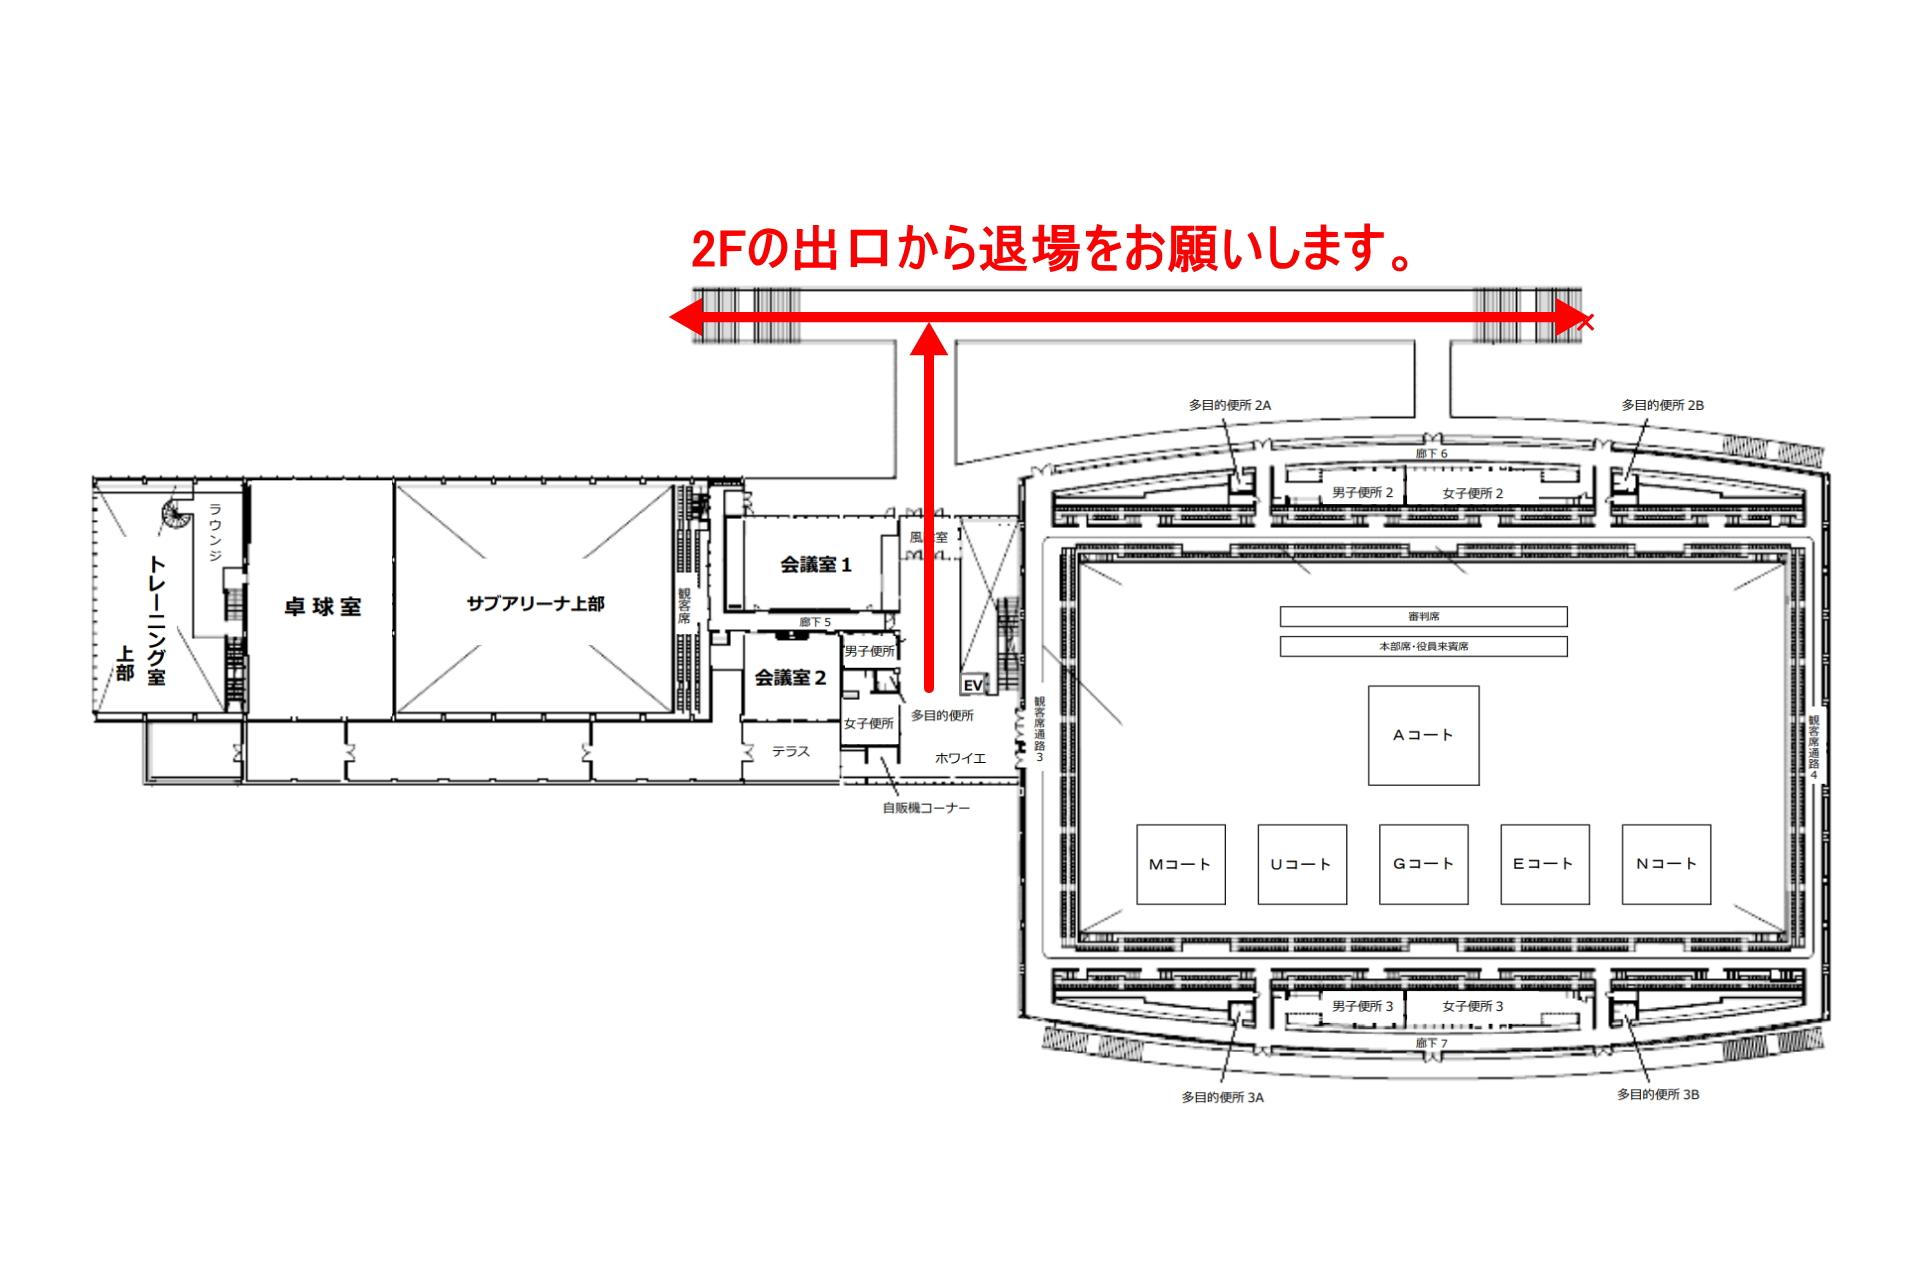 MUGEN02会場図_2F_1